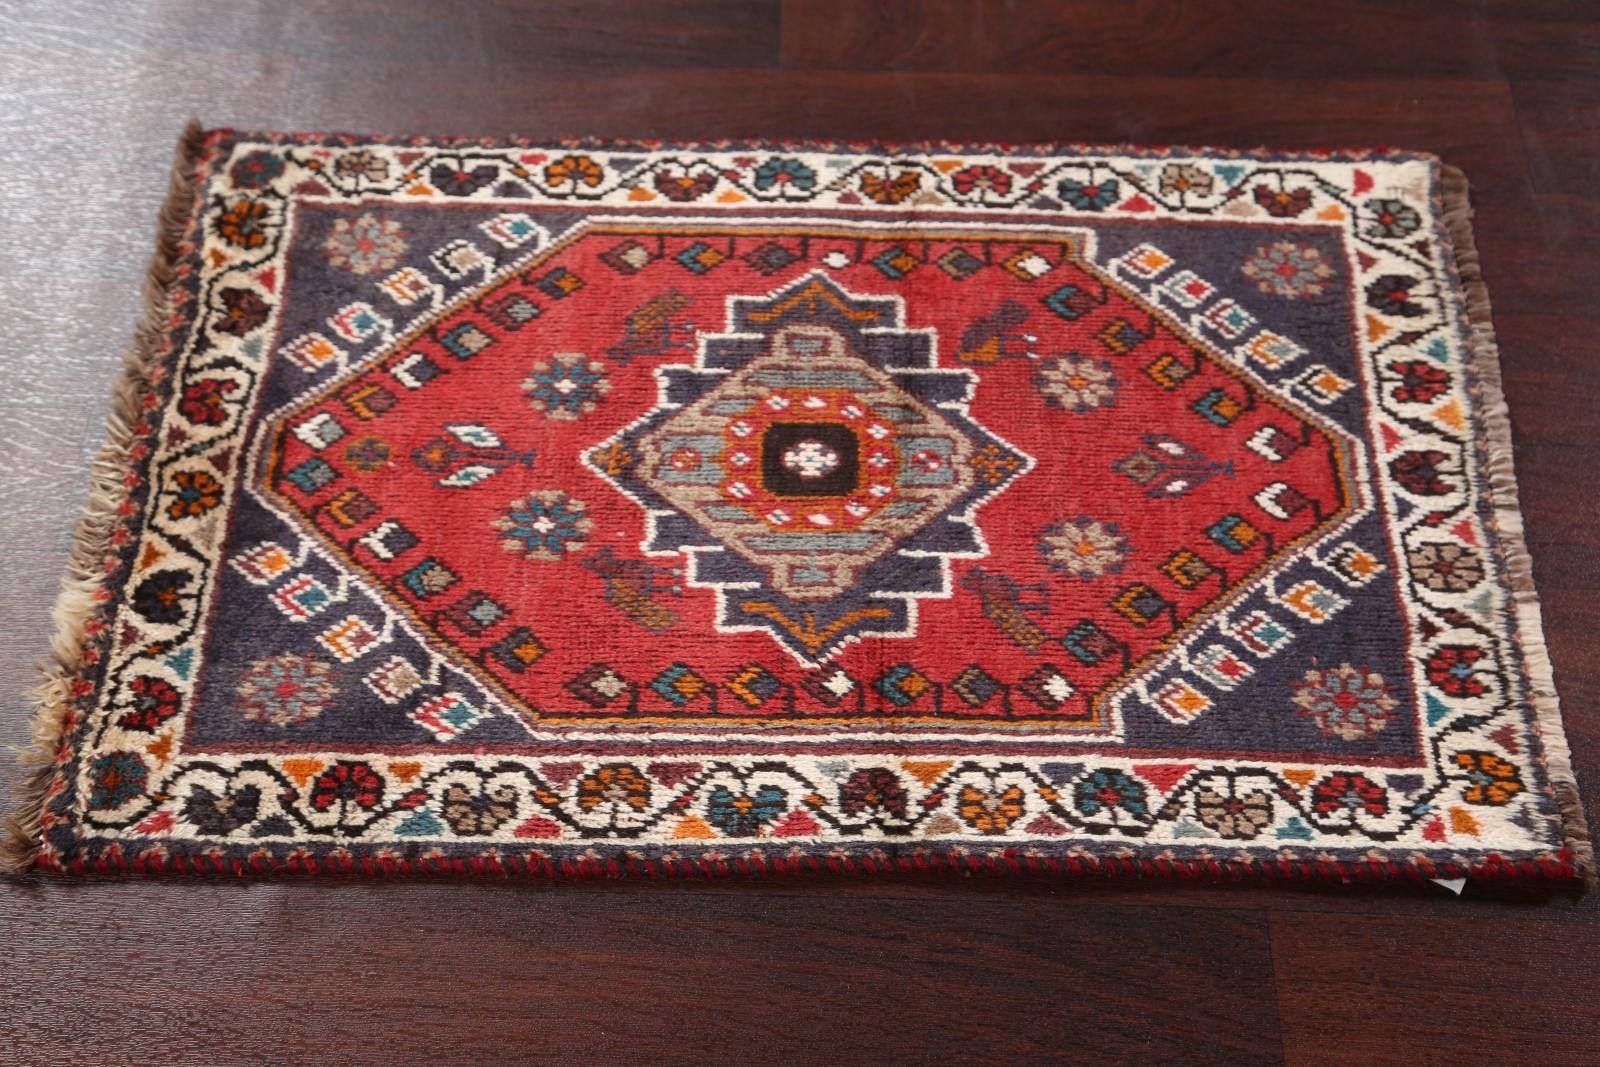 Foyer Rug Uk : Antique geometric foyer size handmade shiraz persian